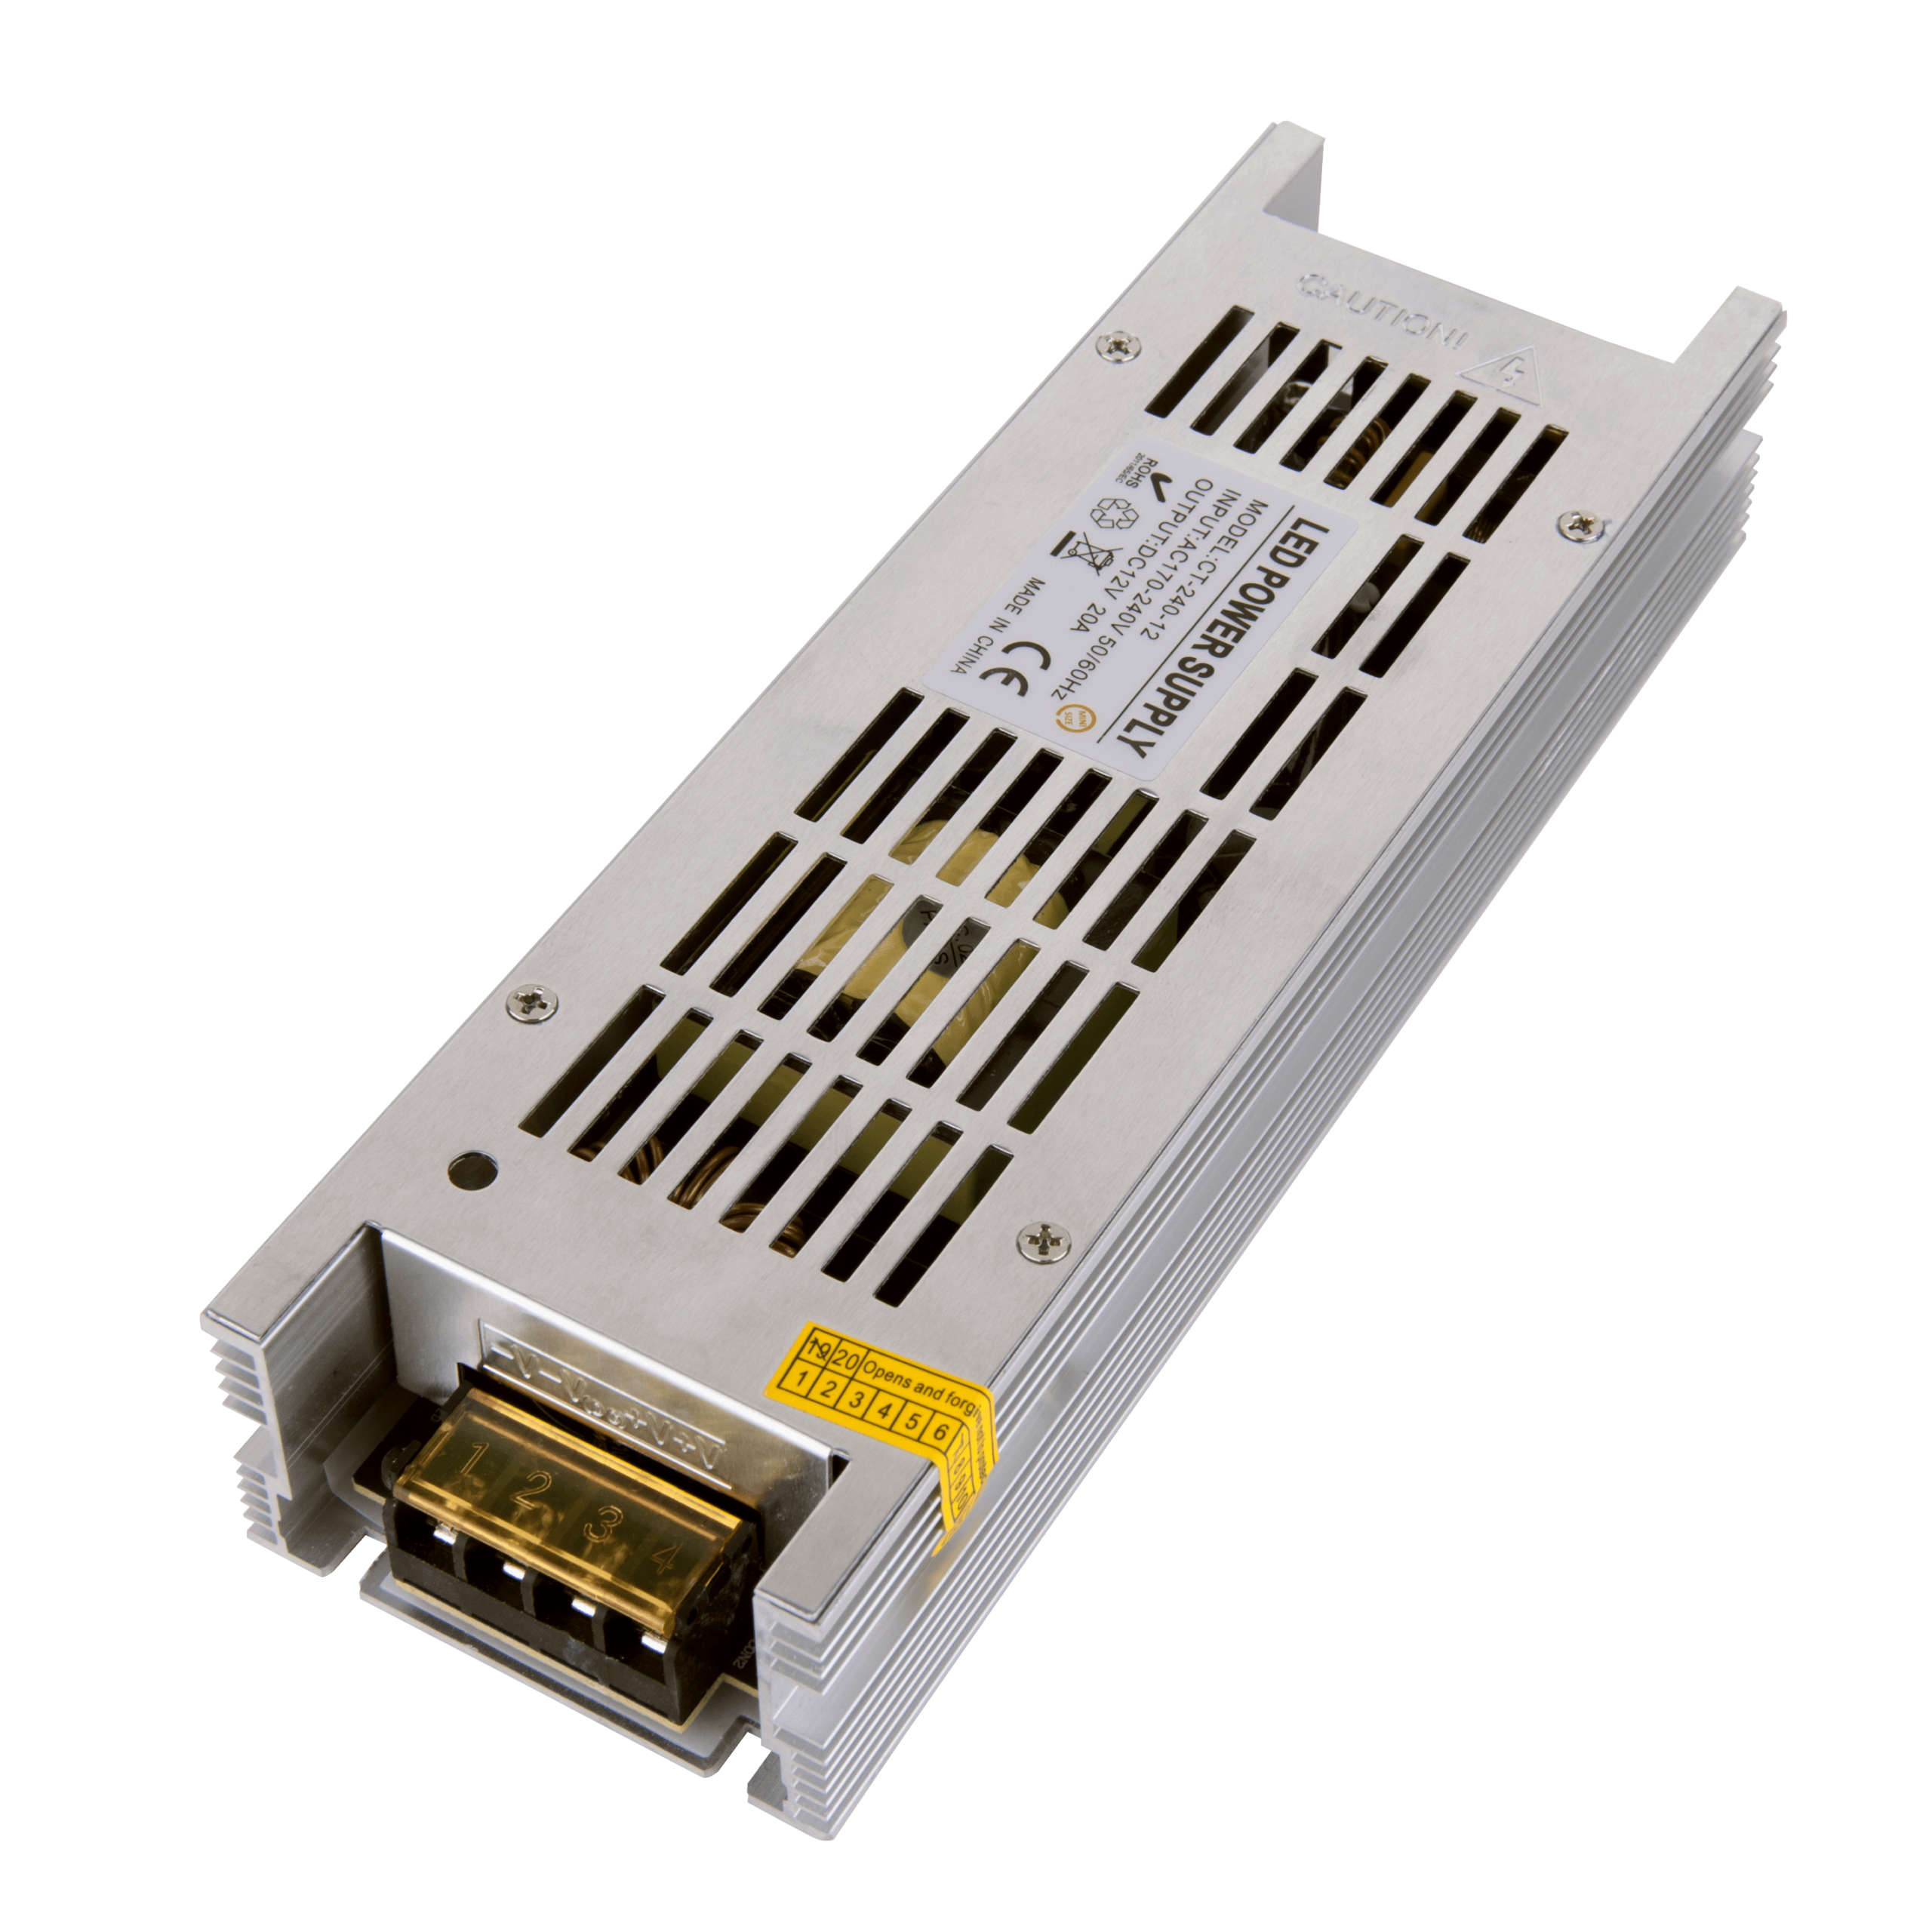 Трансформатор 250W 12V IP00 LST 20A